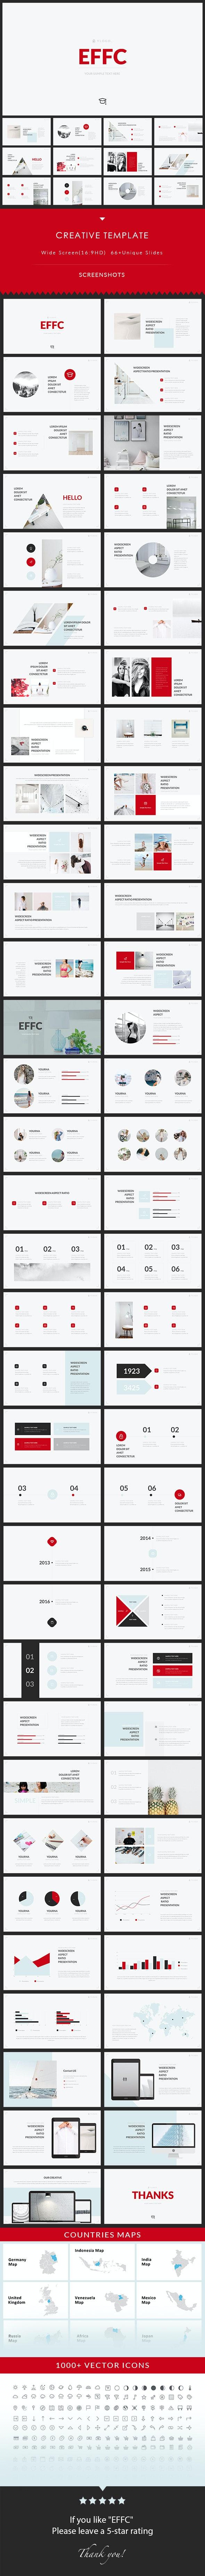 EFFC - Keynote Presentation Template - Creative Keynote Templates